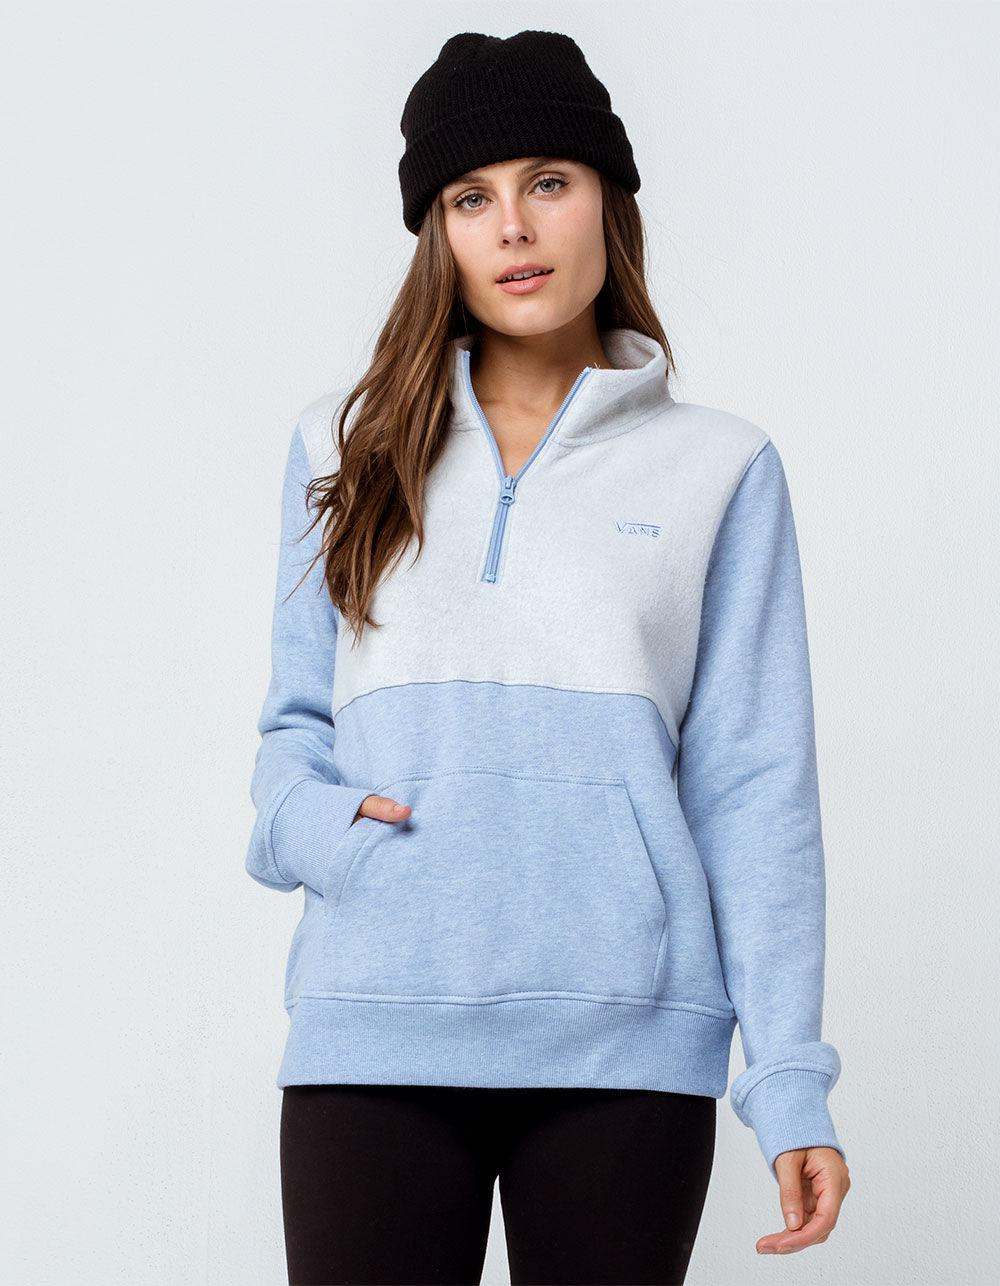 cd77111b6a4 Lyst - Vans Glacial Half Zip Womens Sweatshirt in Blue